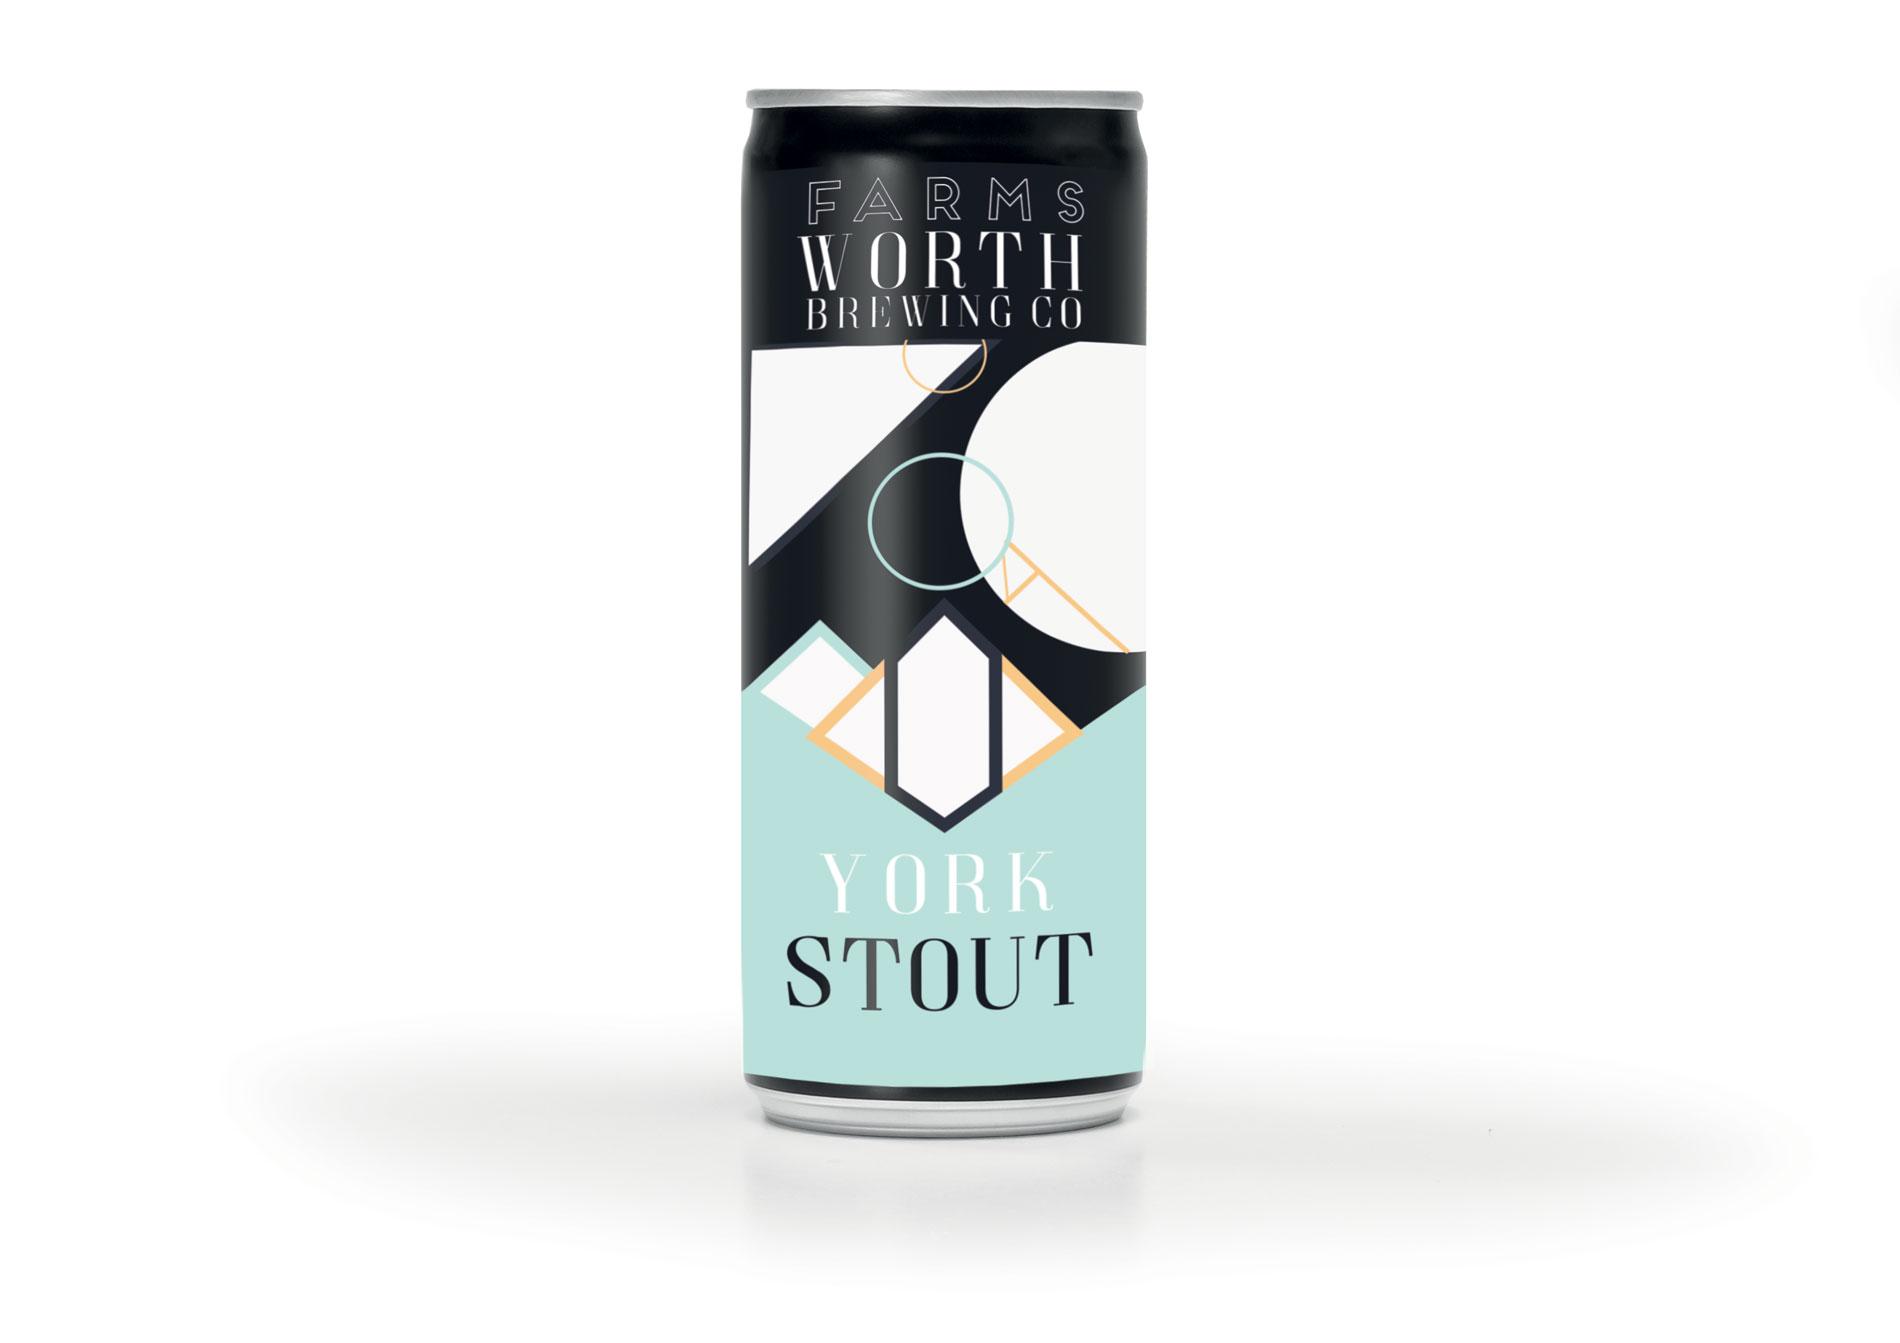 Farmsworth brewing co